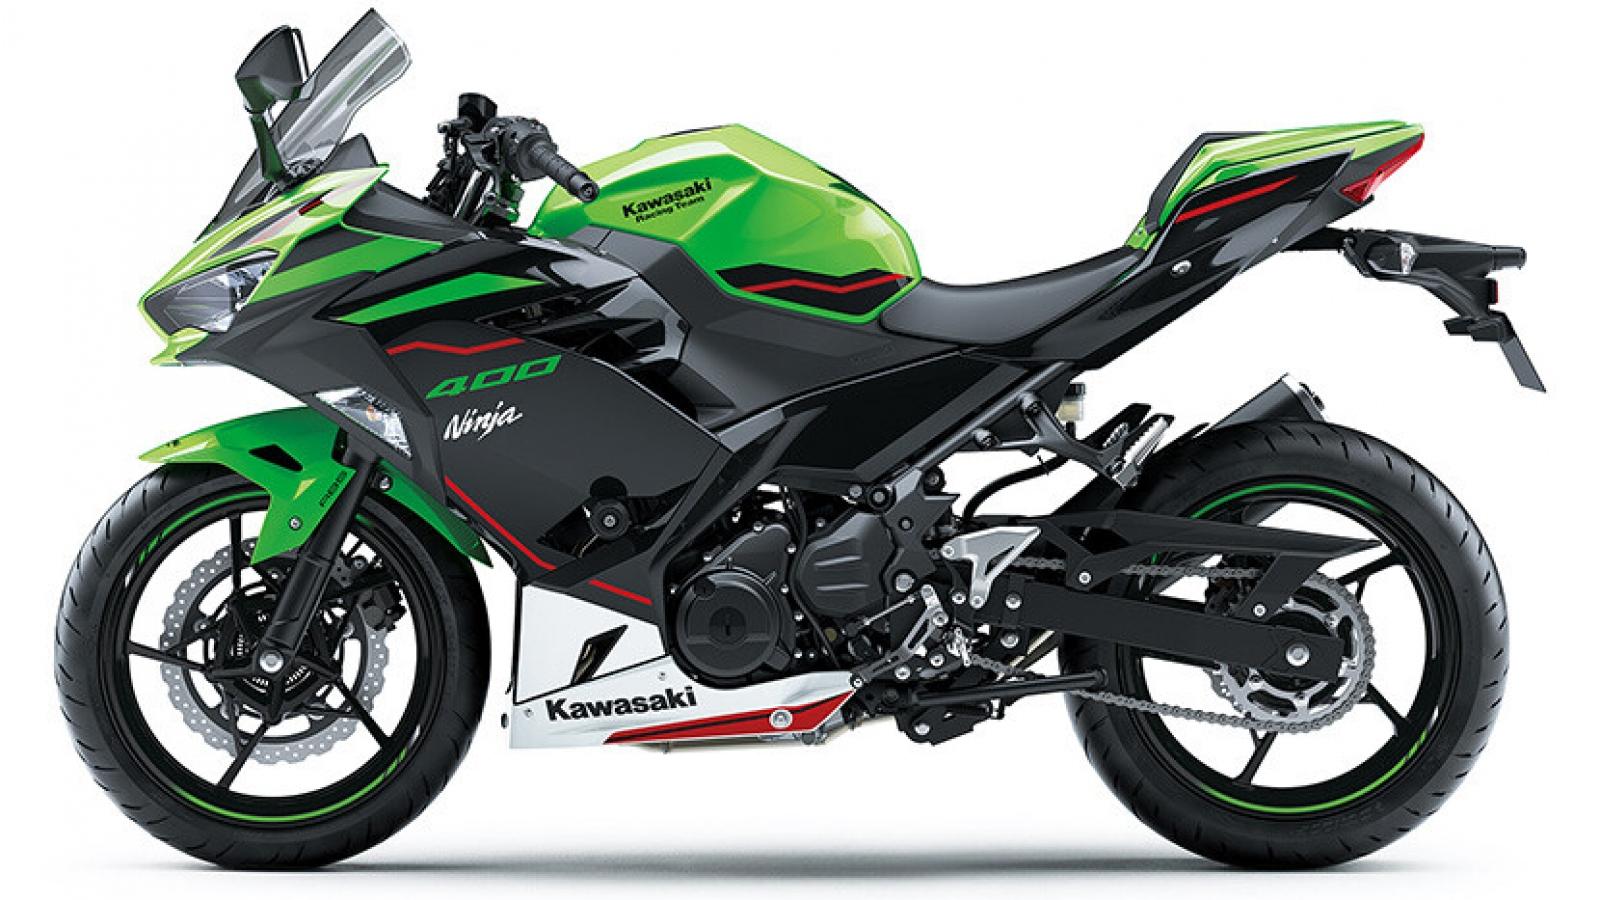 Kawasaki Ninja 400 2021 có thêm 4 màu sơn mới